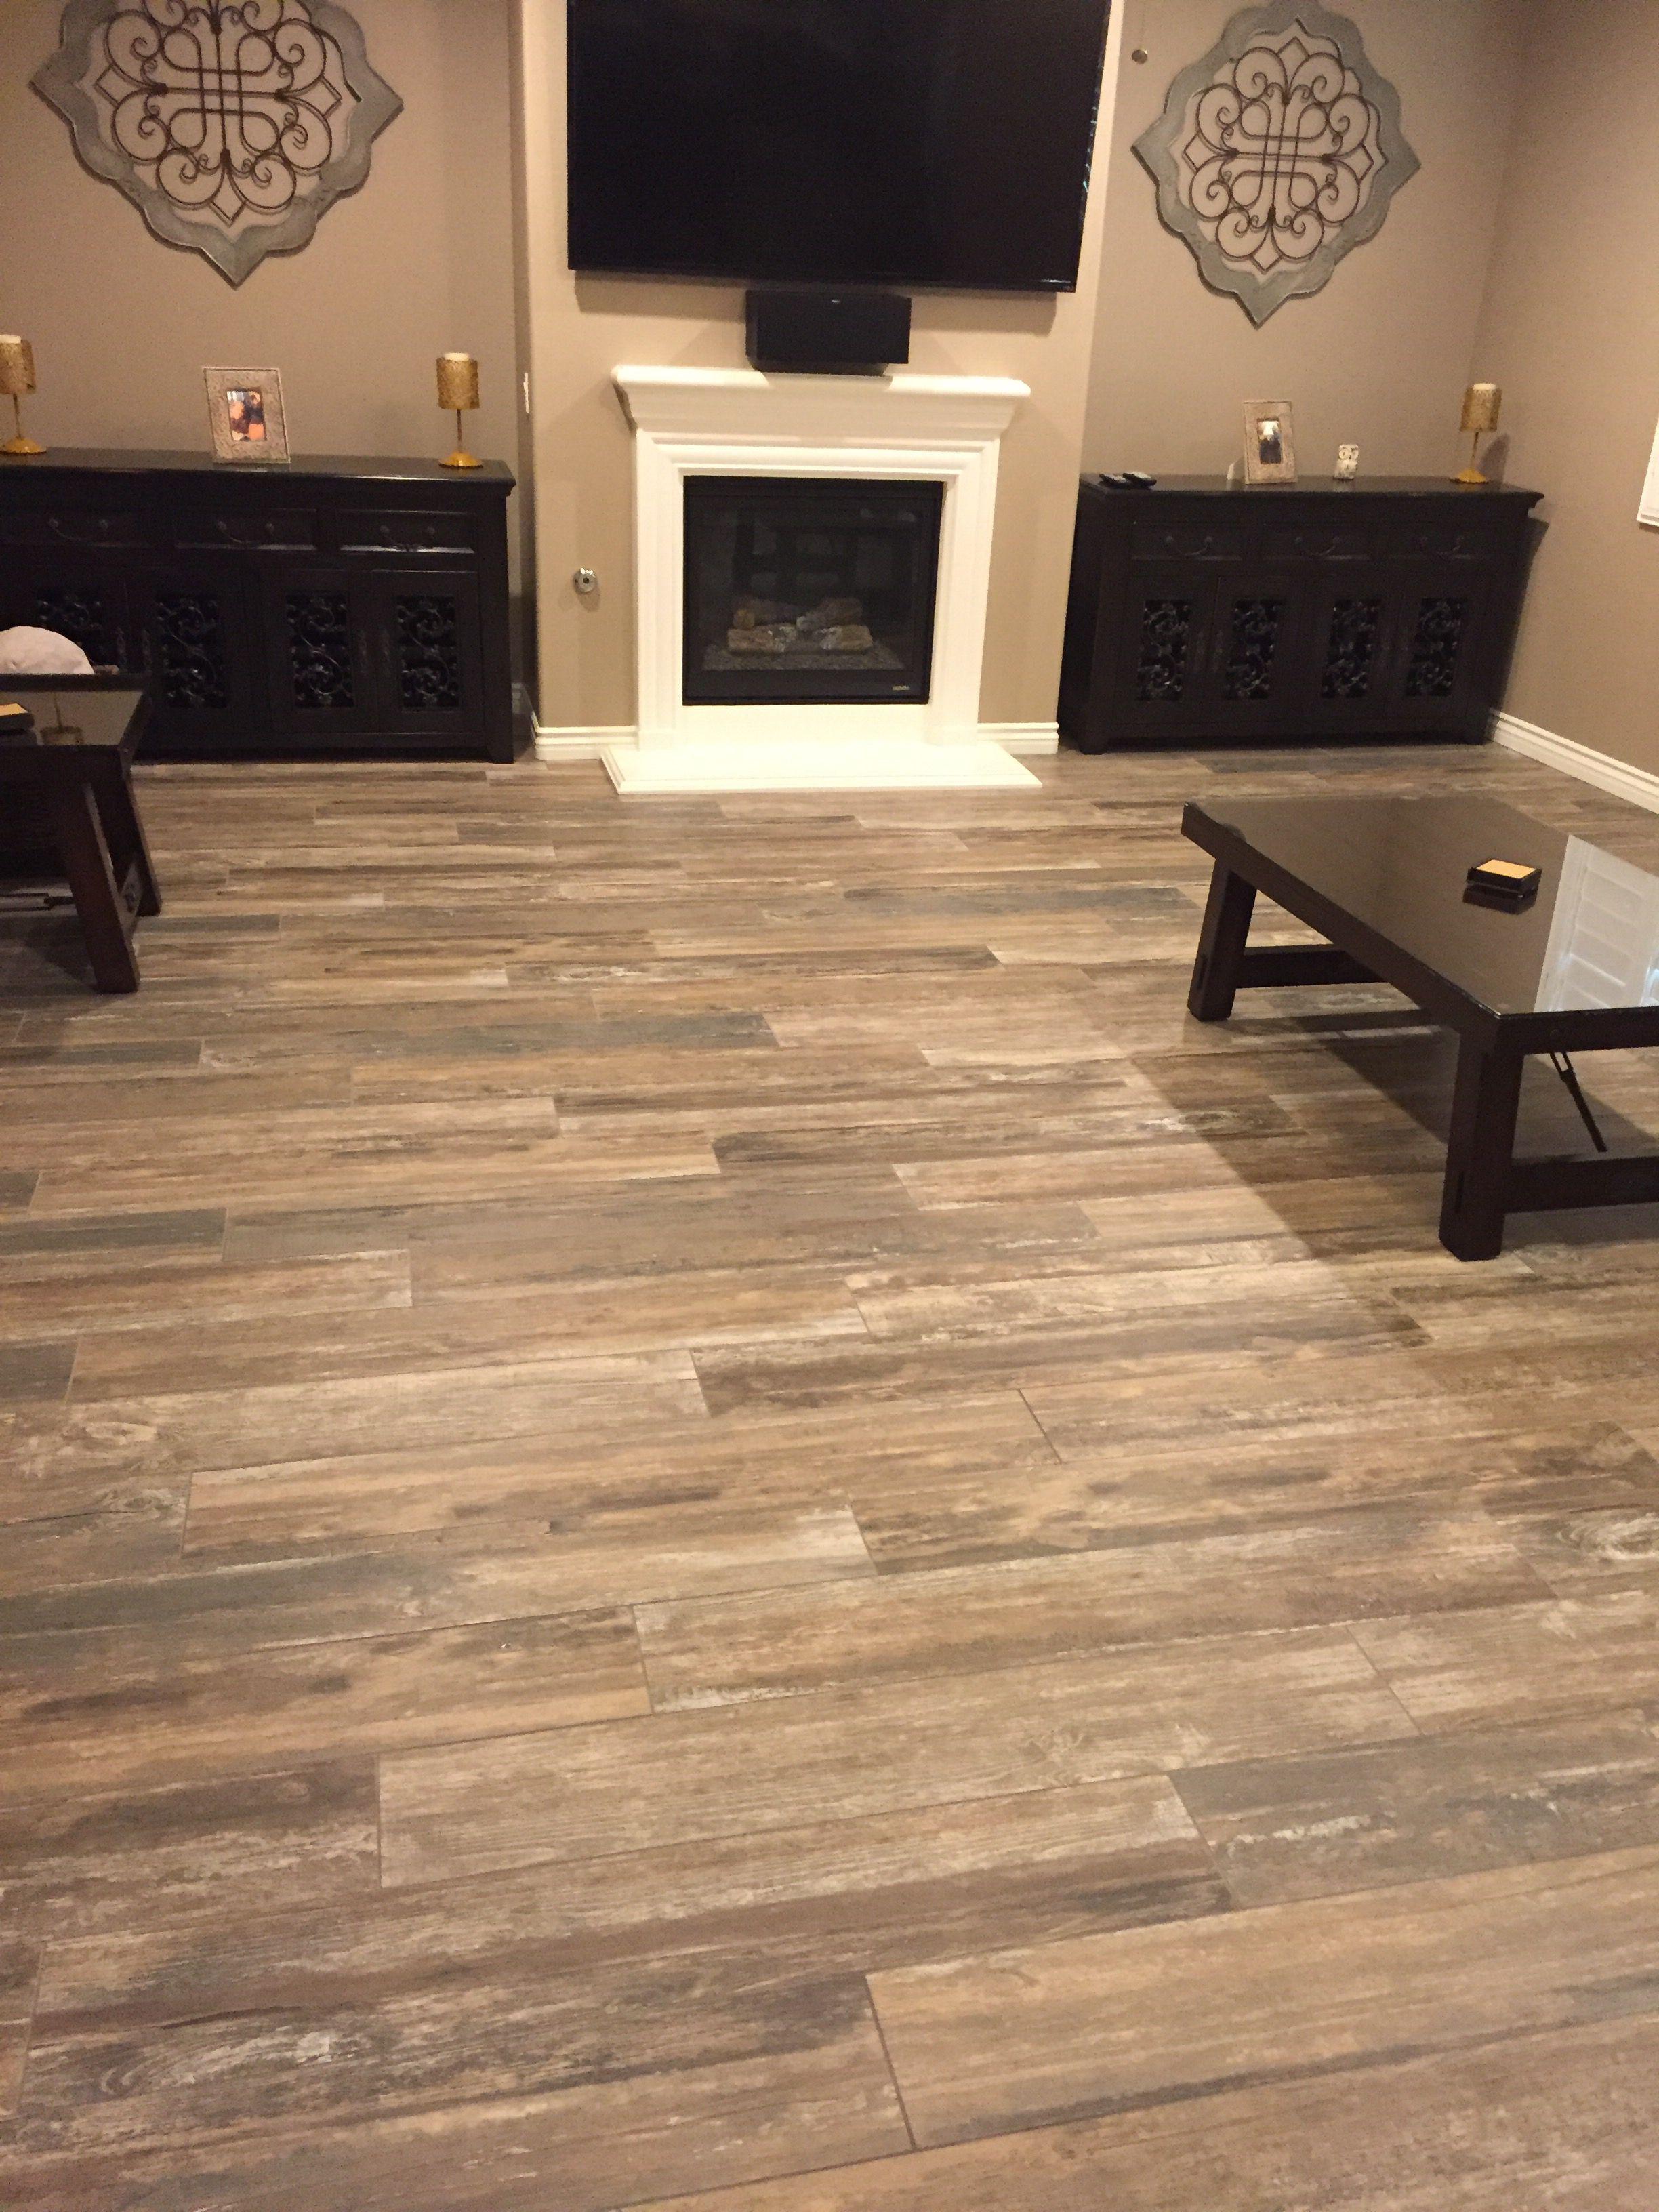 tile hardwood floor patterns of hardwood floor designs schlafzimmer bett mit bettkasten inspirierend for tile flooring that looks like wood mediterranea boardwalk venice beach